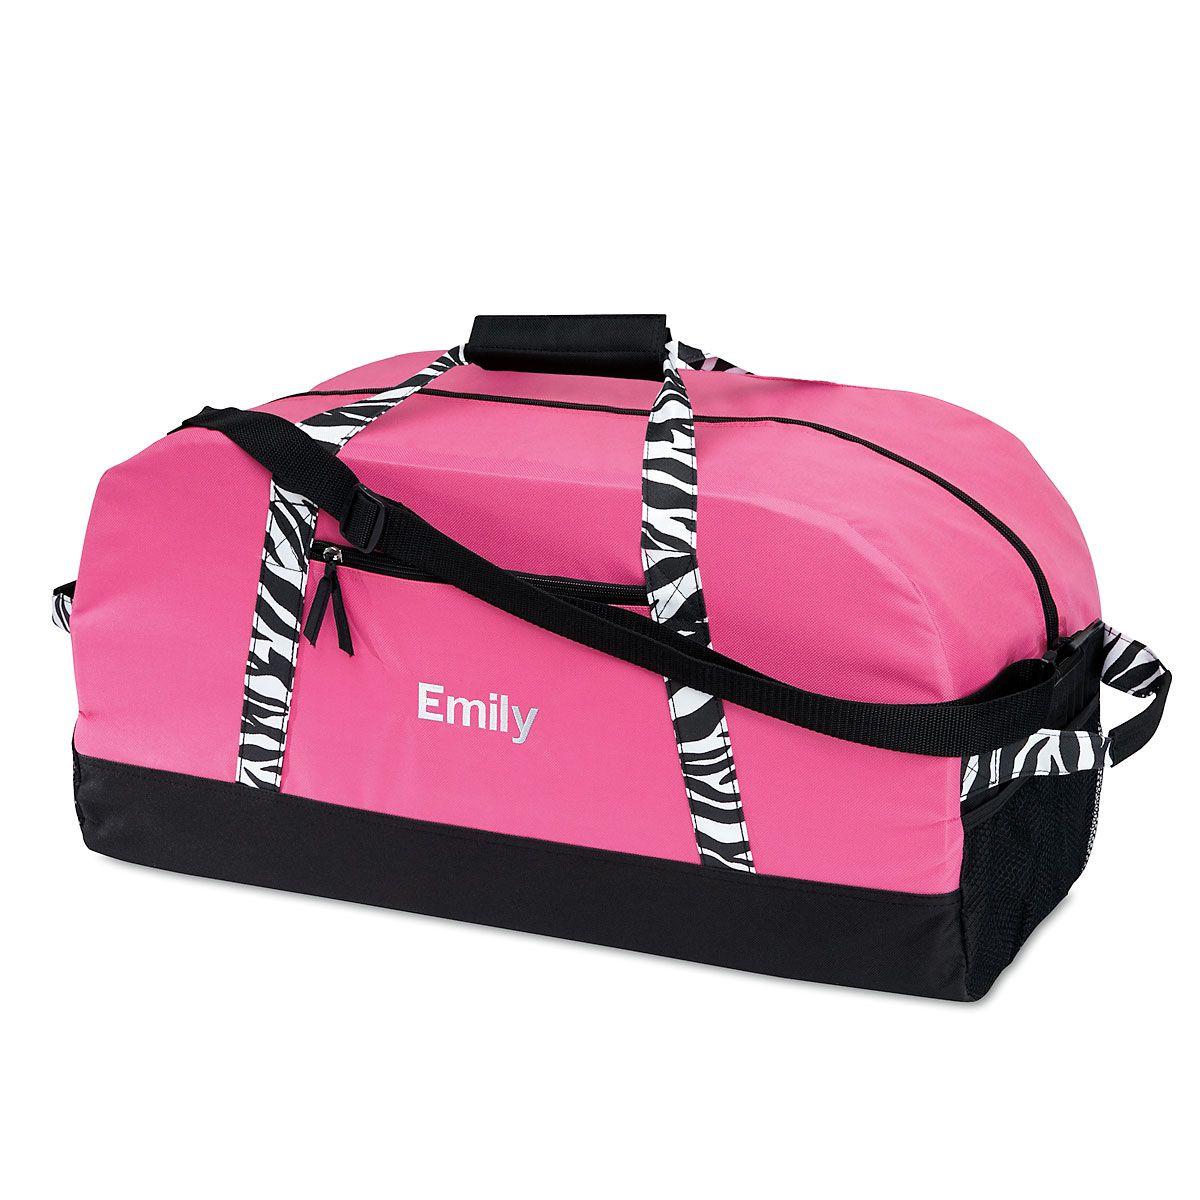 "Zebra Print 23"" Personalized Duffel Bag"